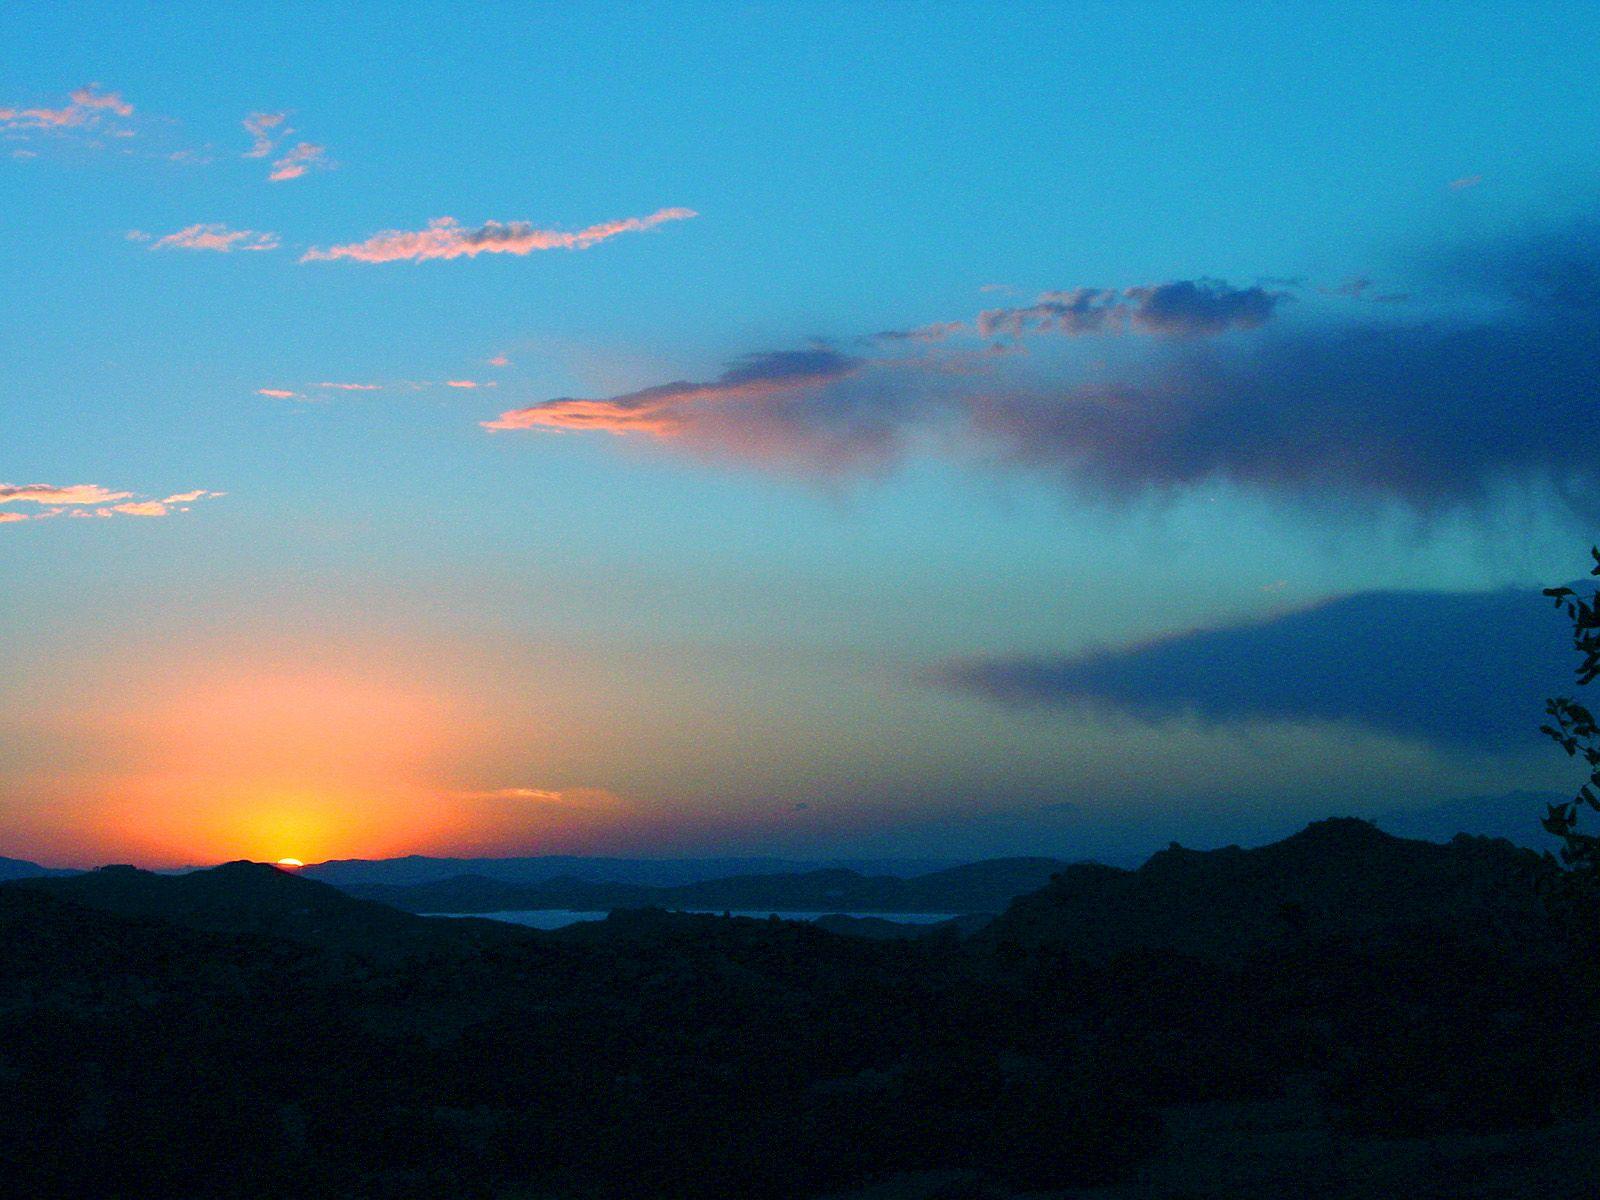 Cielo Amanecer Buscar Con Google Sunset Wallpaper Sunset Sky Blue Sky Clouds